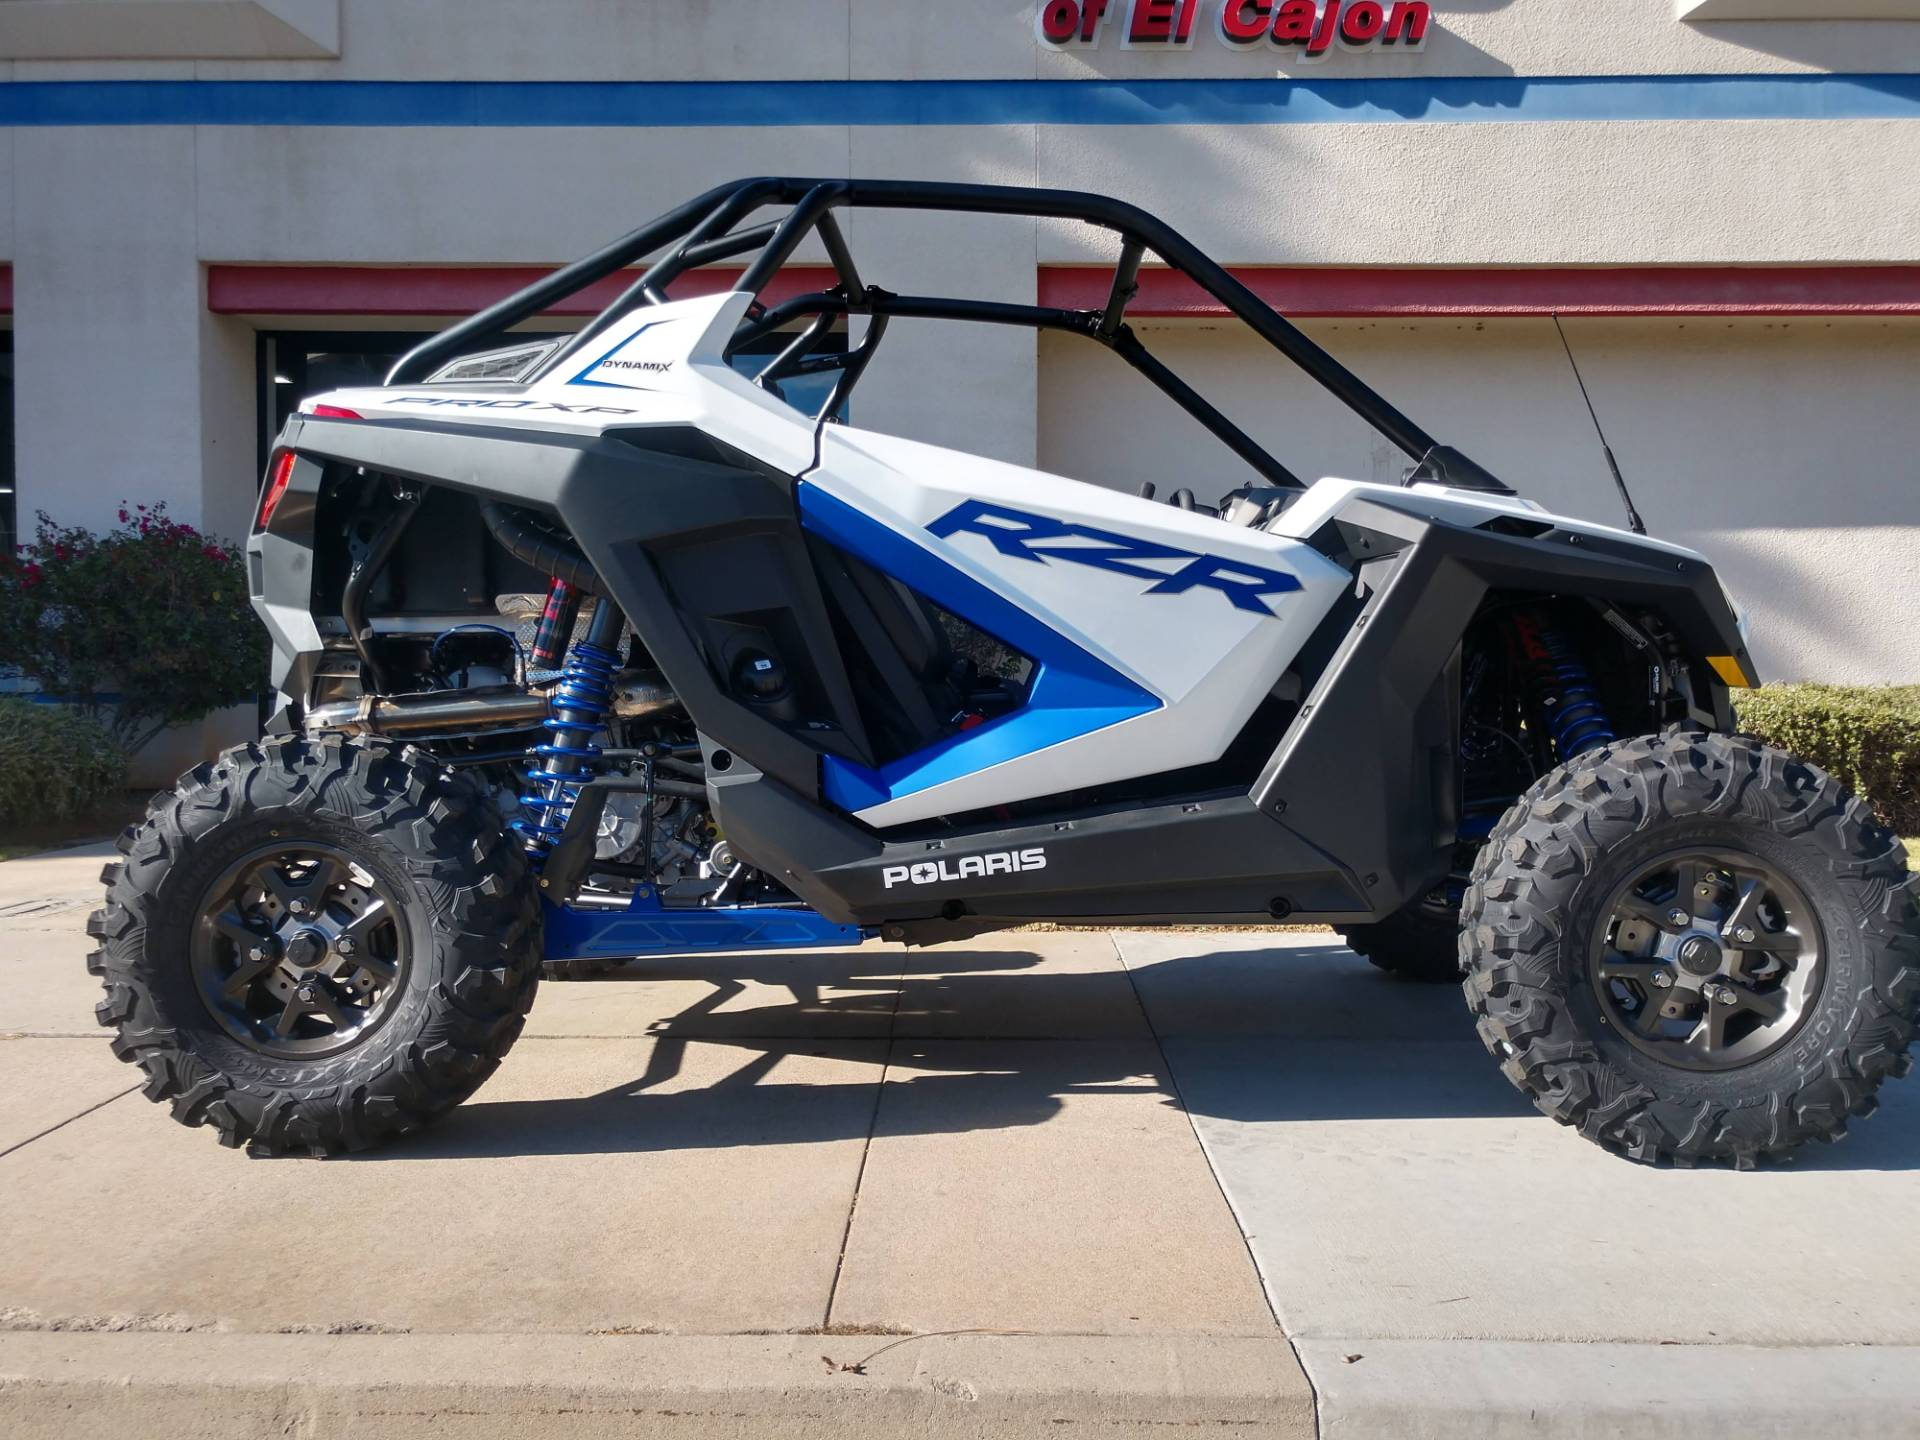 2020 Polaris Rzr Pro Xp Ultimate In El Cajon California